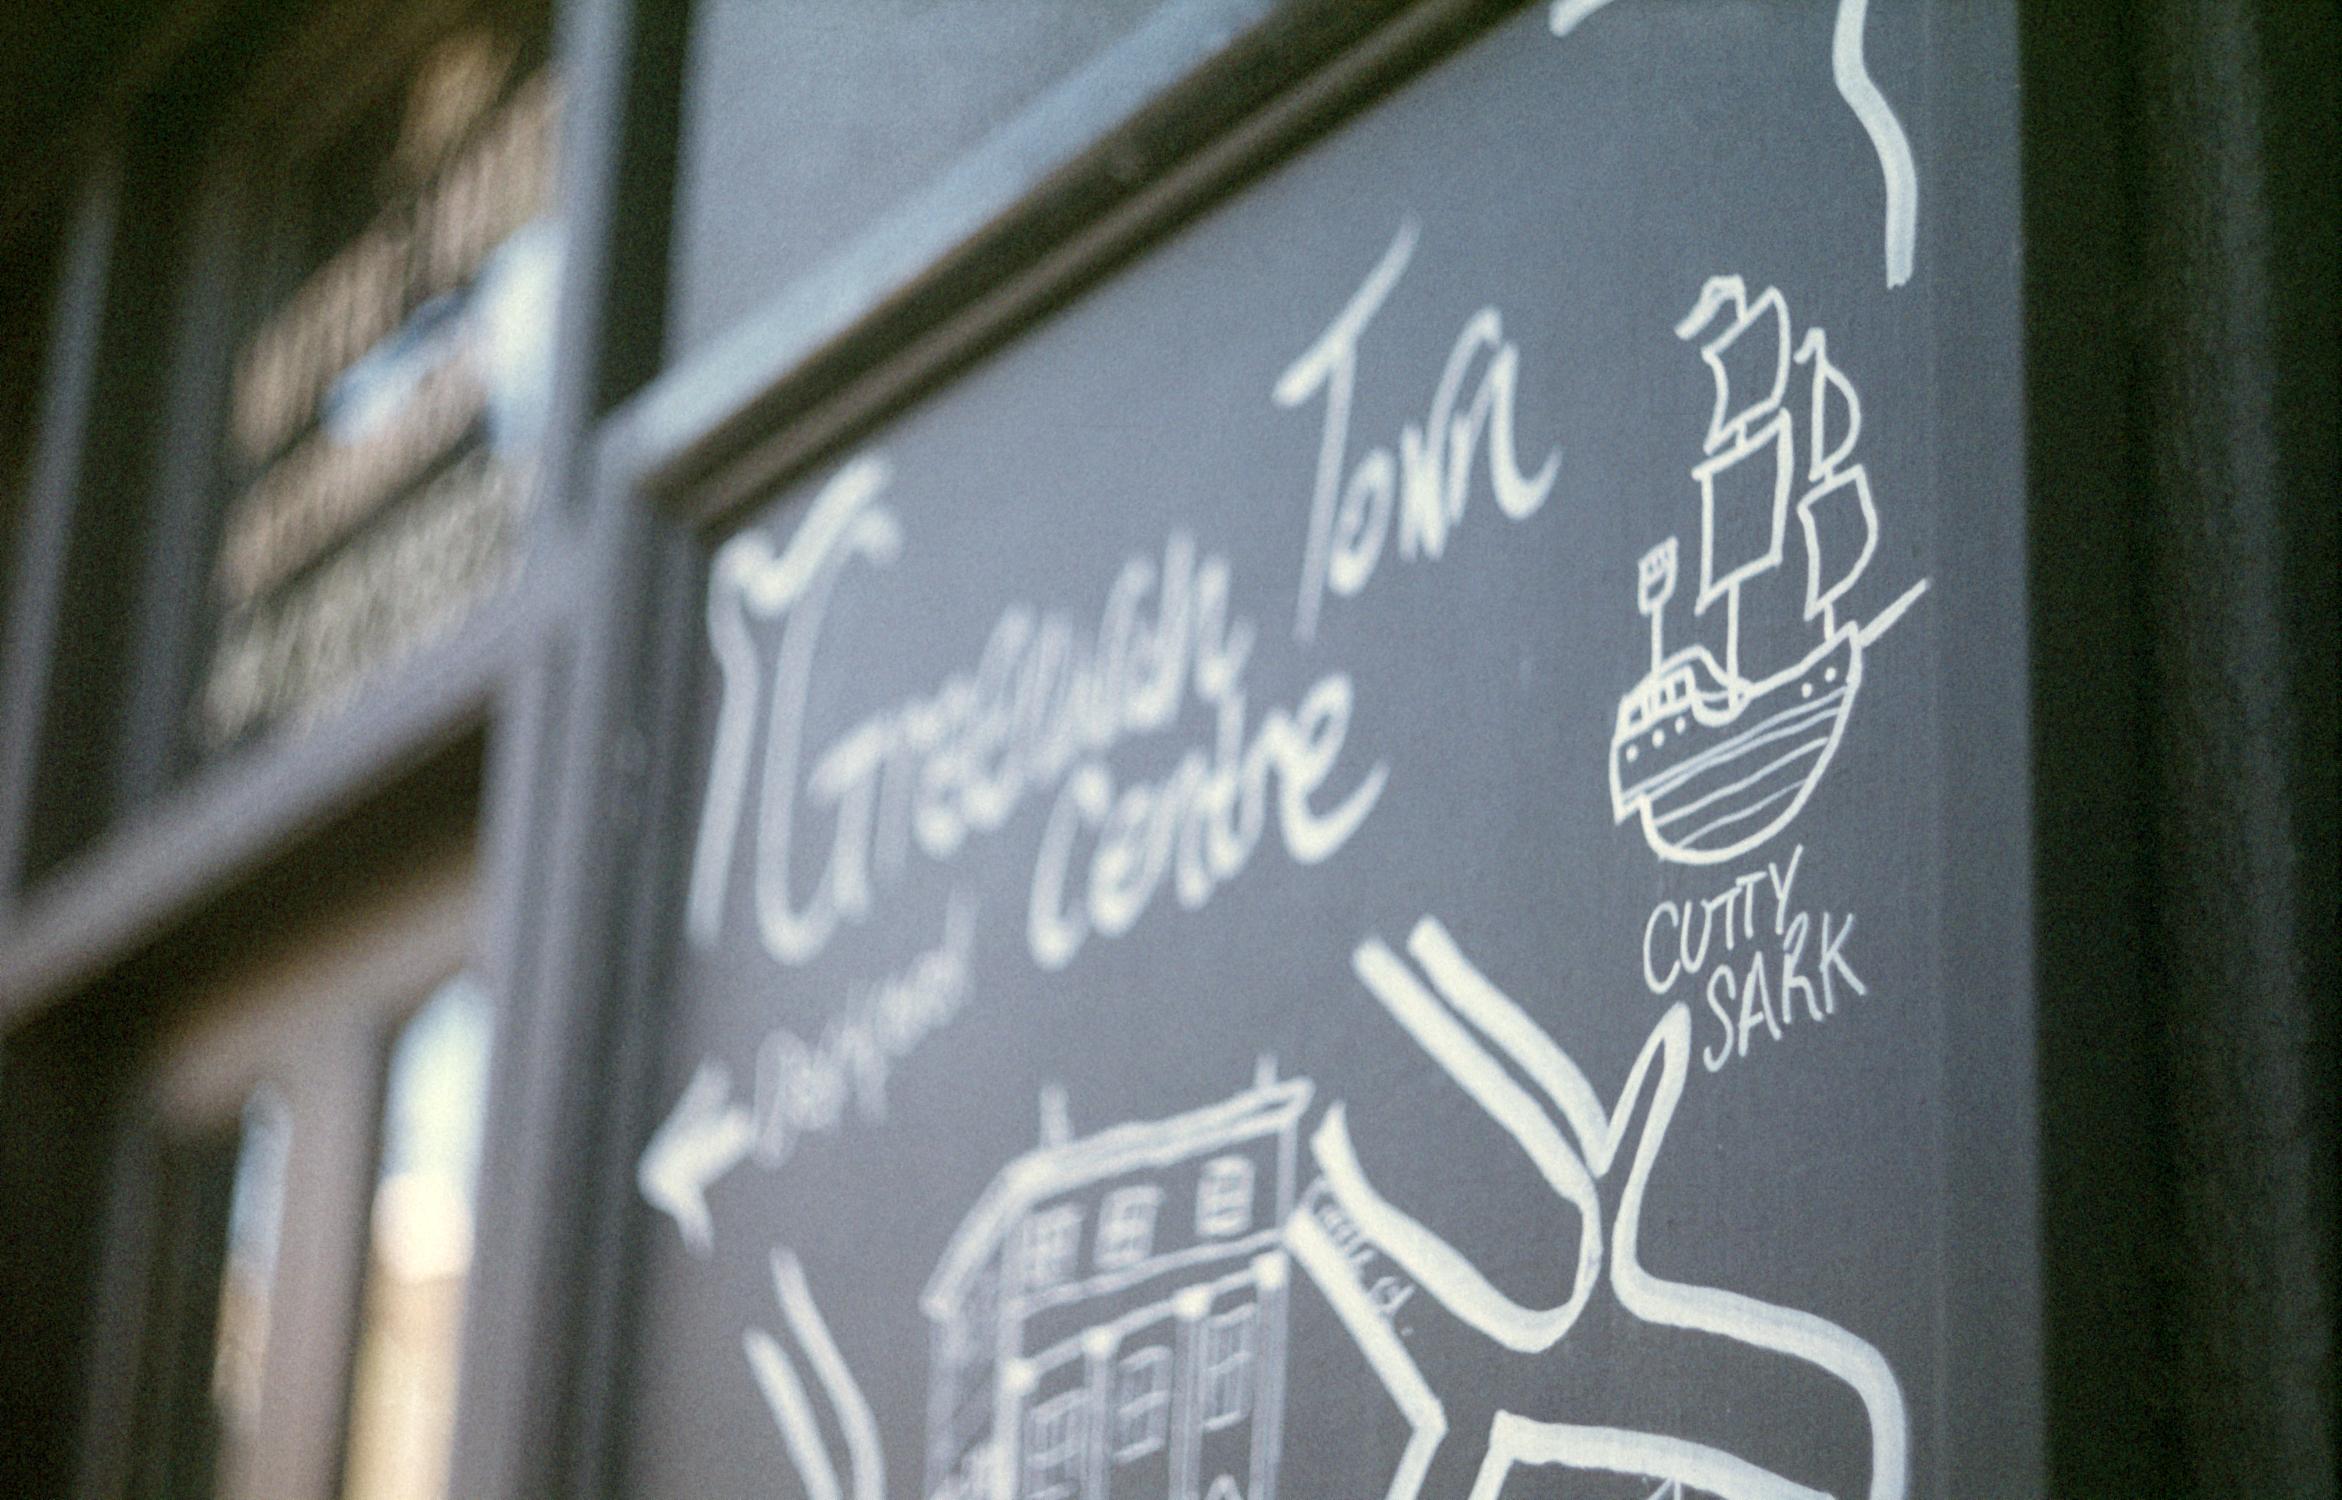 Cutty Sark pub sign (Pic: Stephen Dowling)